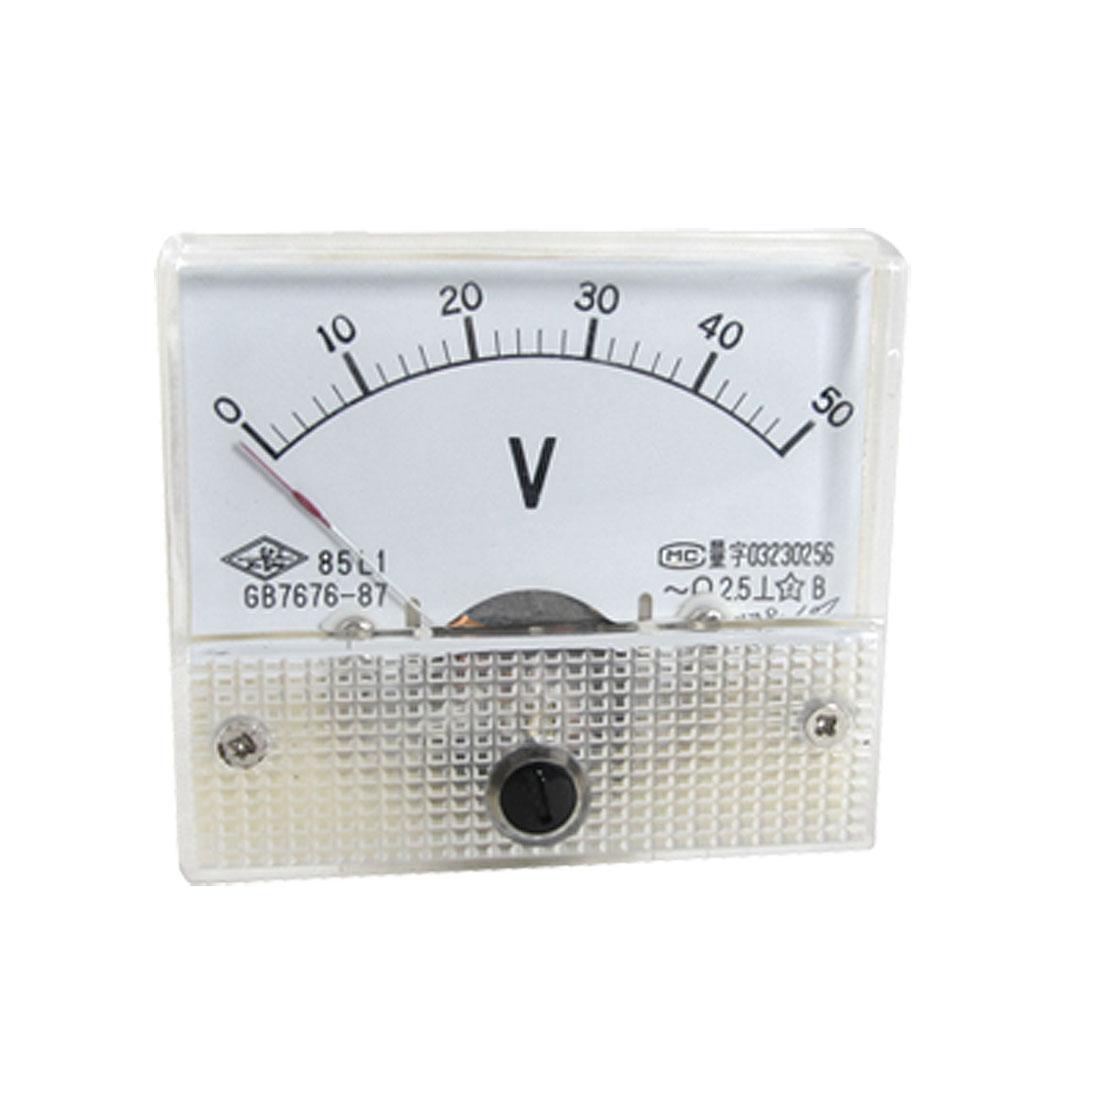 85L1 AC 0-50V Analogue Needle Panel Meter Voltmeter